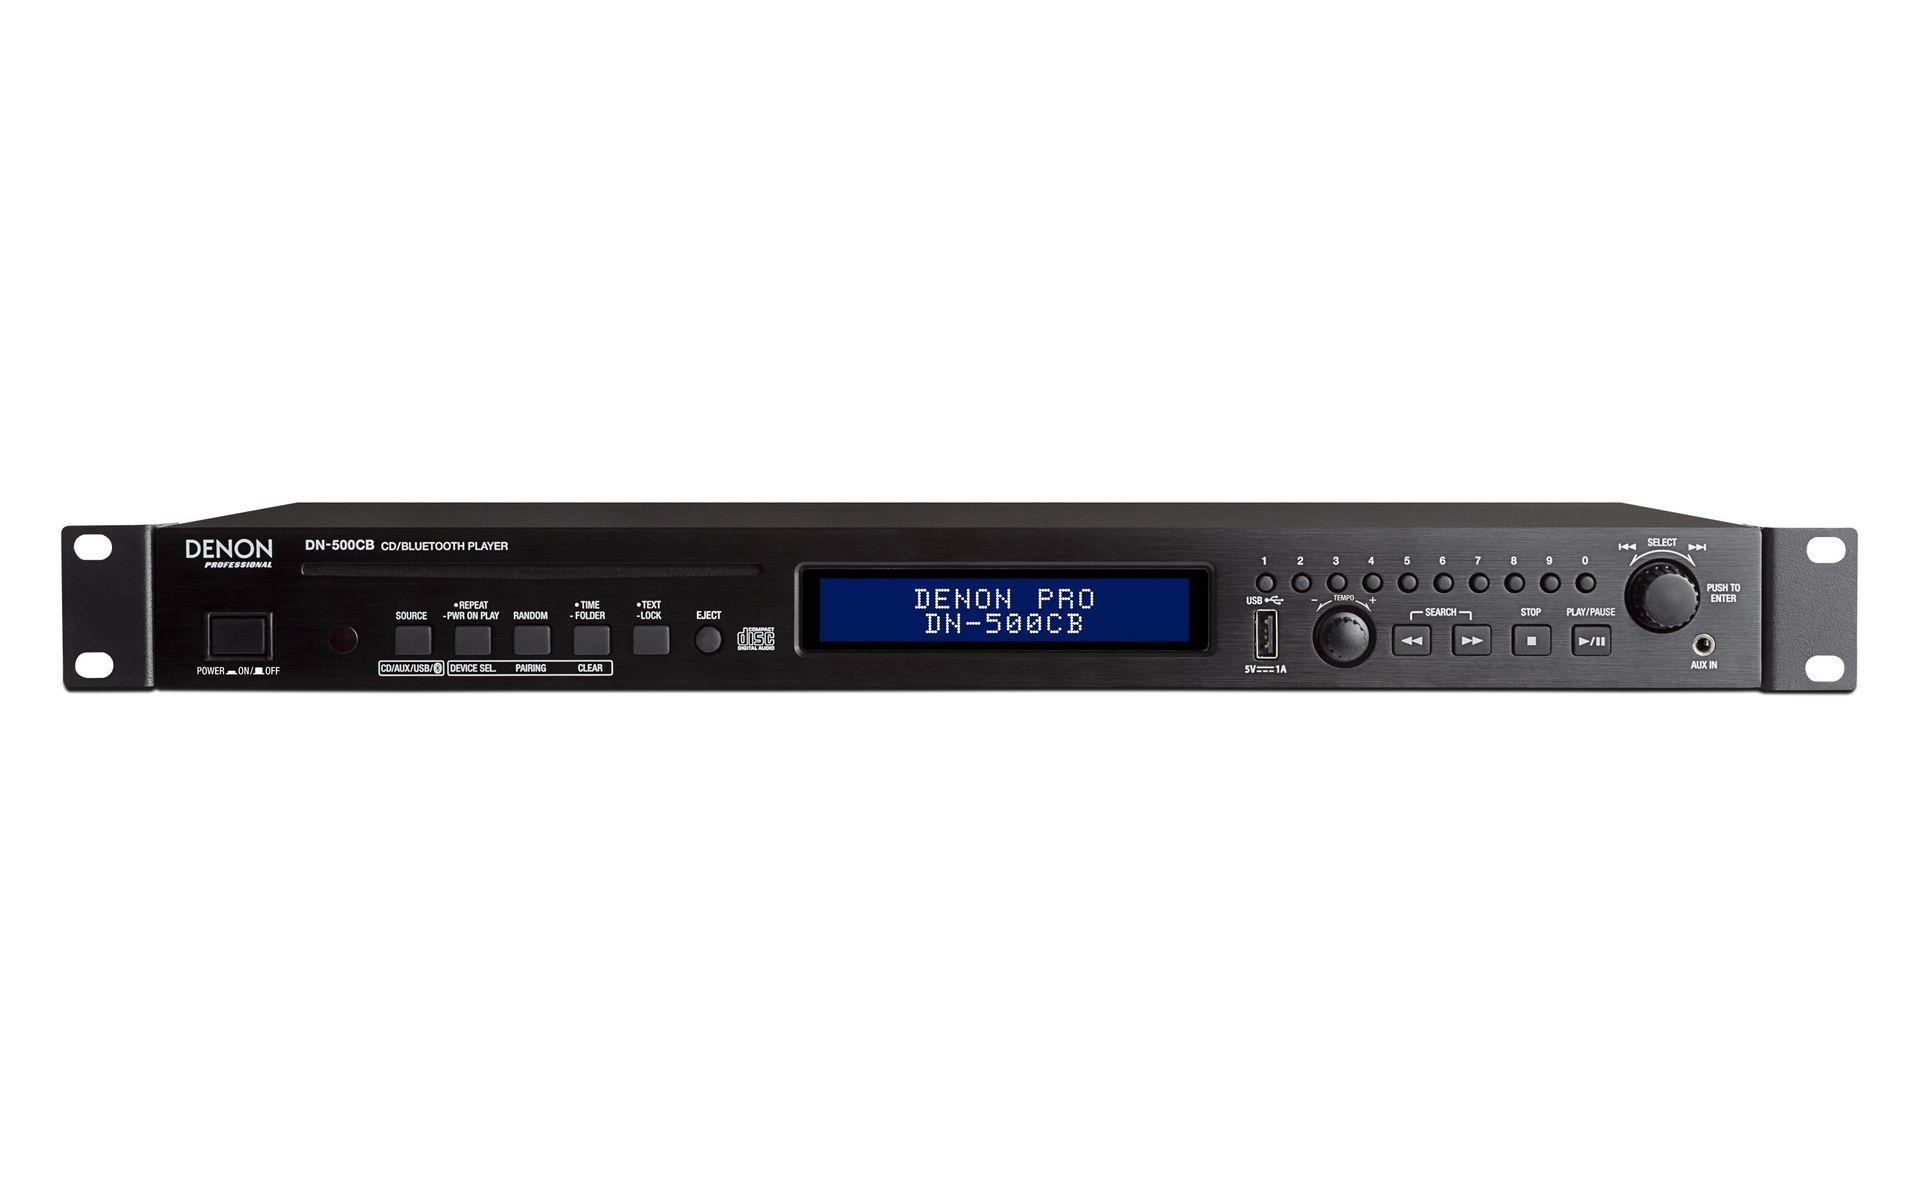 "Denon DN-500 CB 19"" 1 HE Mediaplayer für CD, USB, Bluetooth Medien"